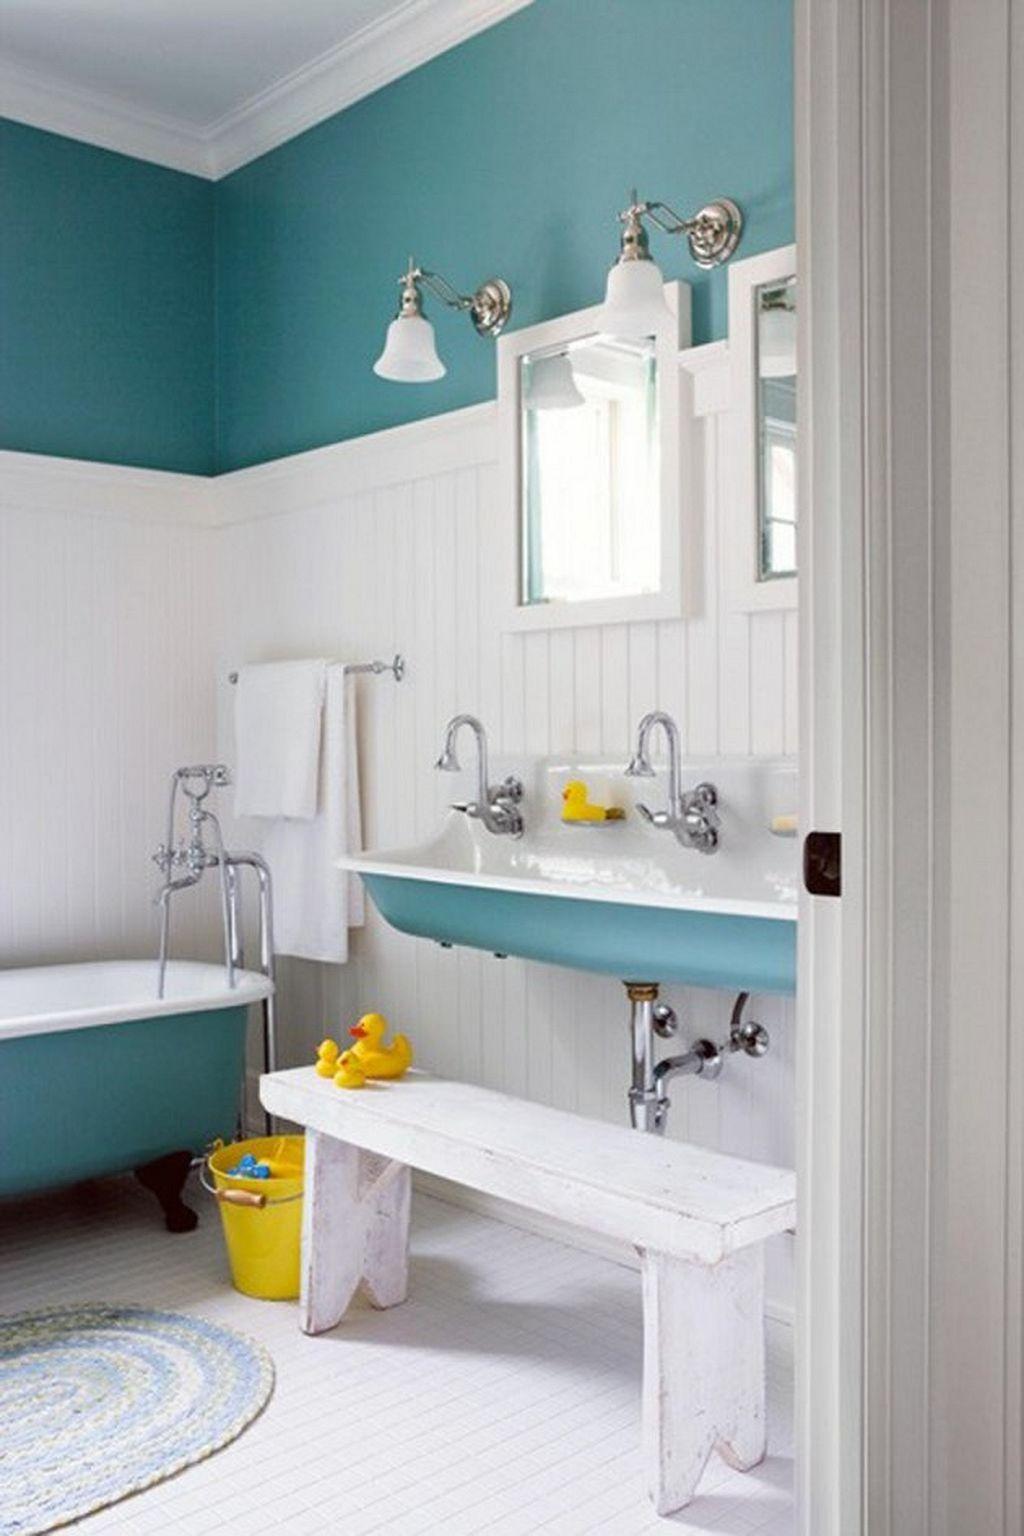 Stunning 67 Colorful Bathroom Ideas That Surely You Would Like Https Pinarchitecture Com 67 Colorful Bath Kid Bathroom Decor Childrens Bathroom Boys Bathroom